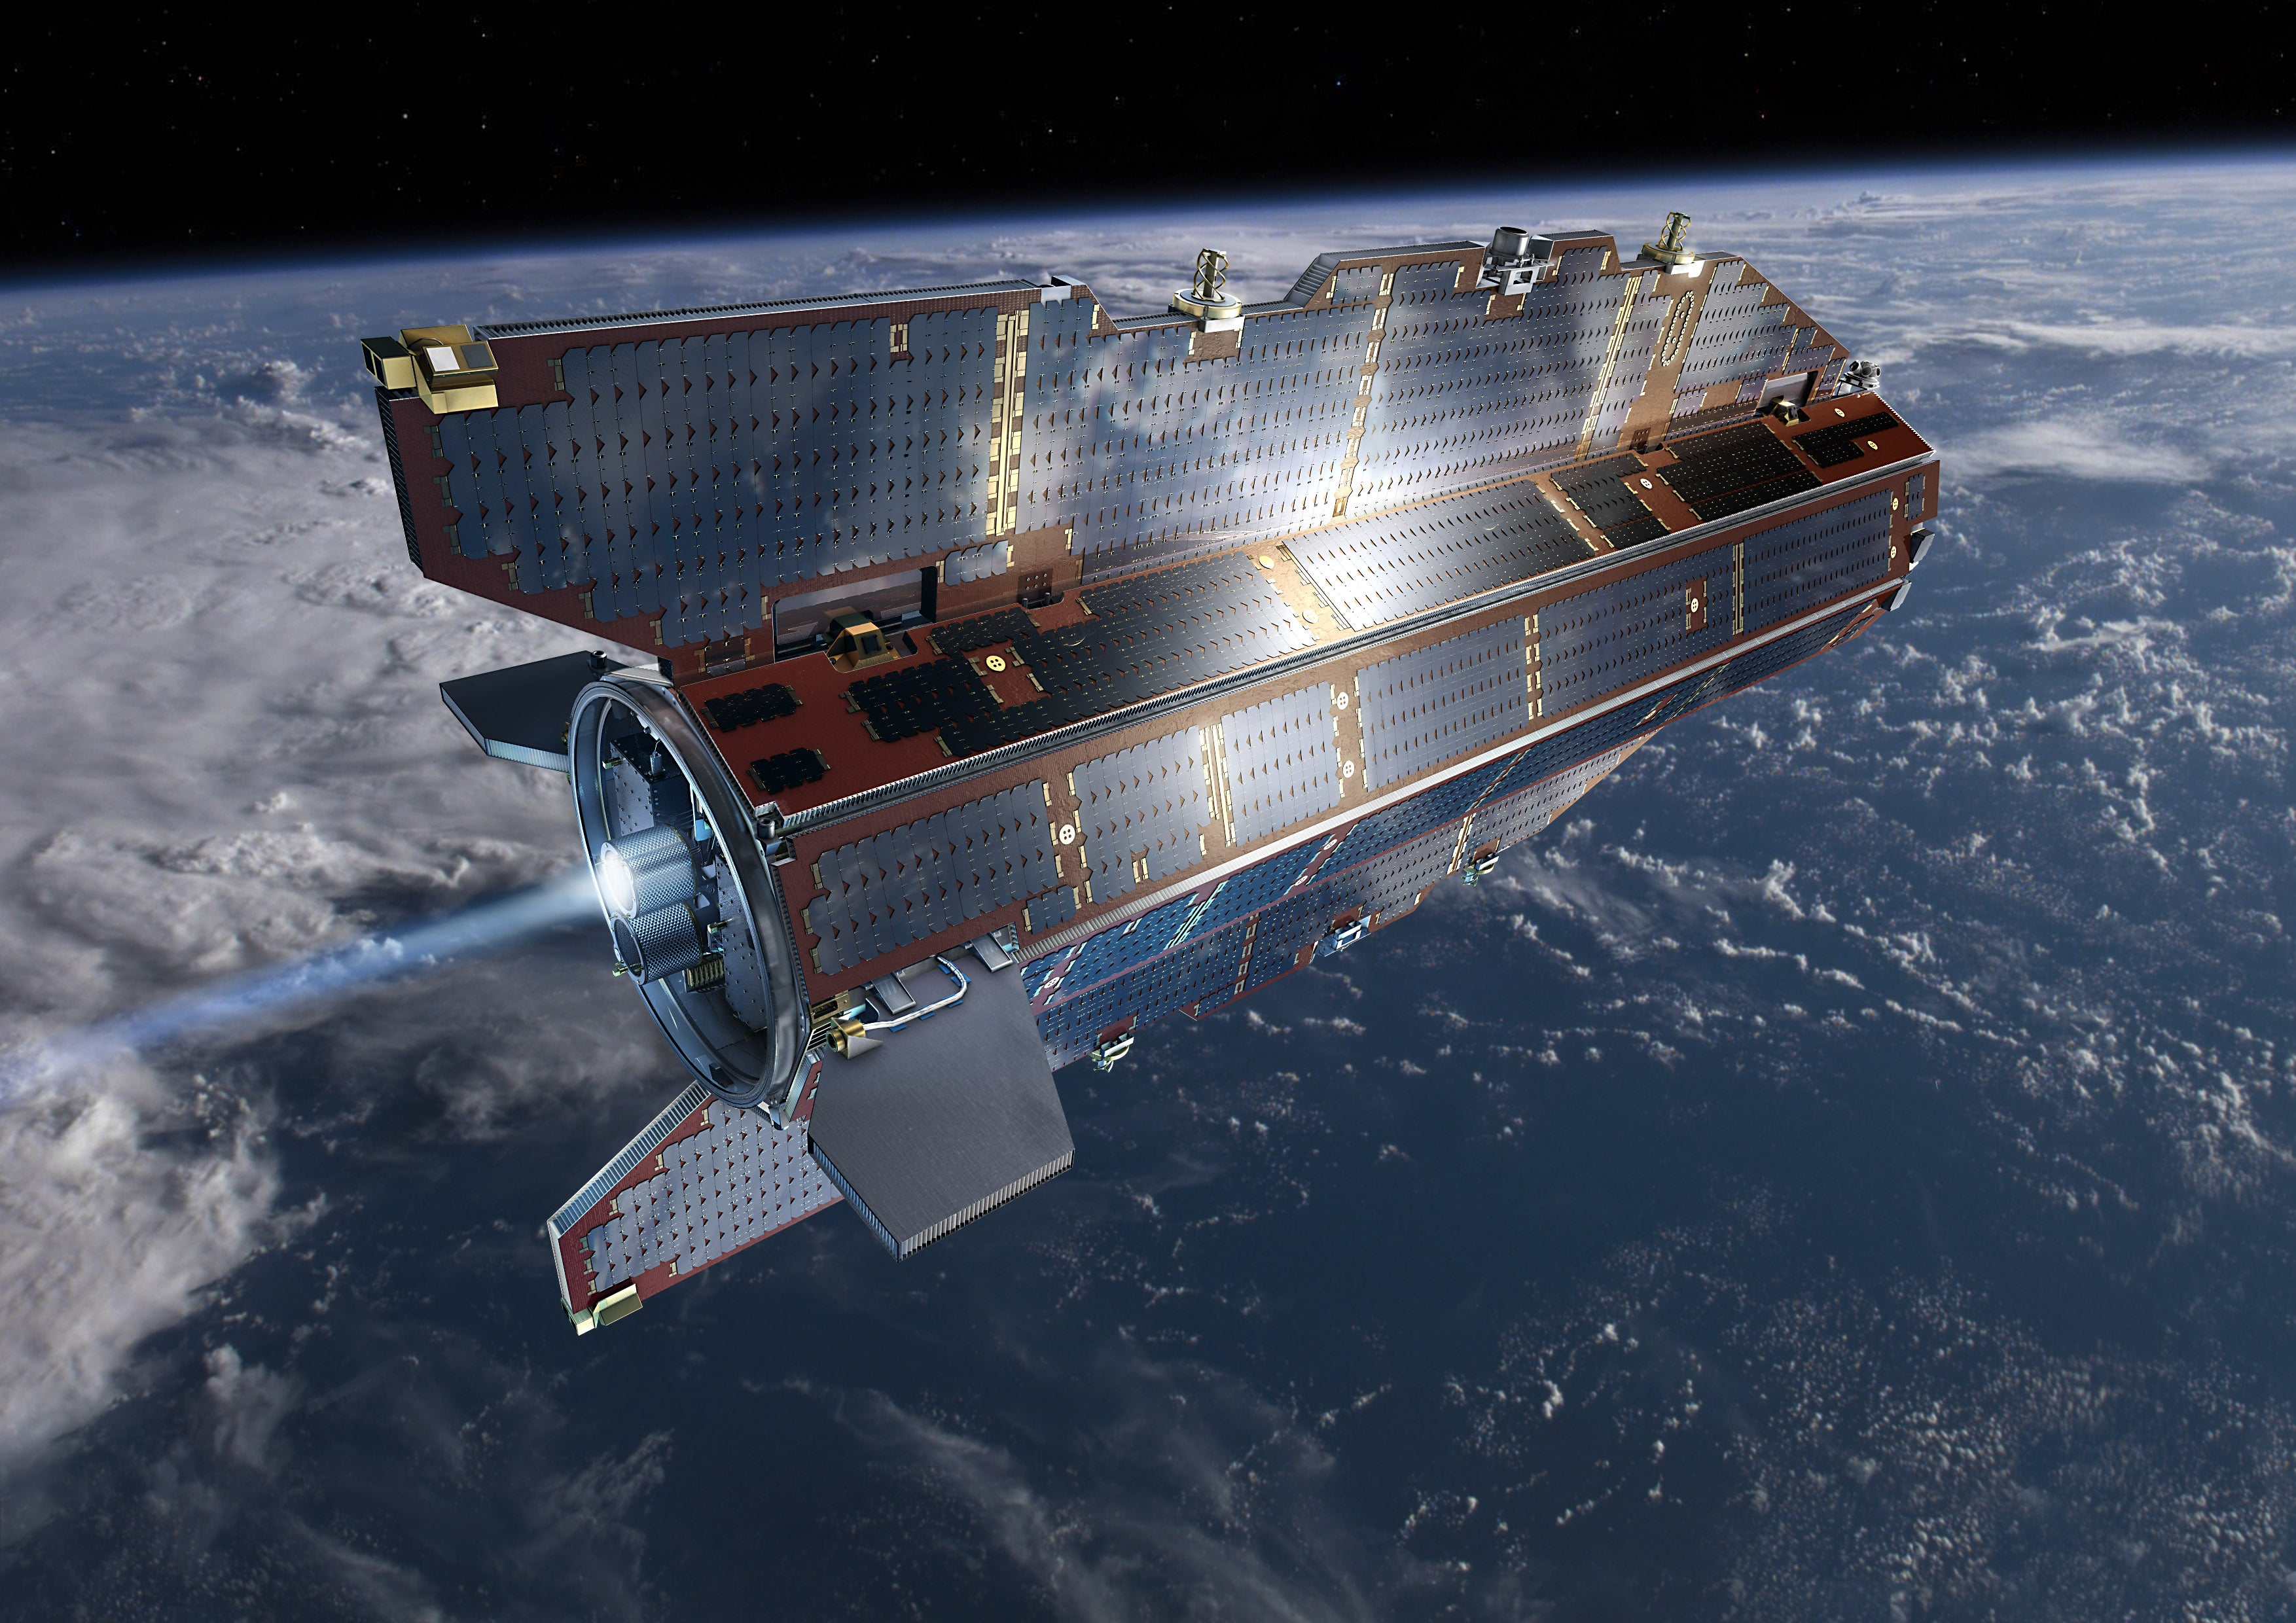 This Gravity-Sensing Satellite Peeks Beneath the Earth's Surface